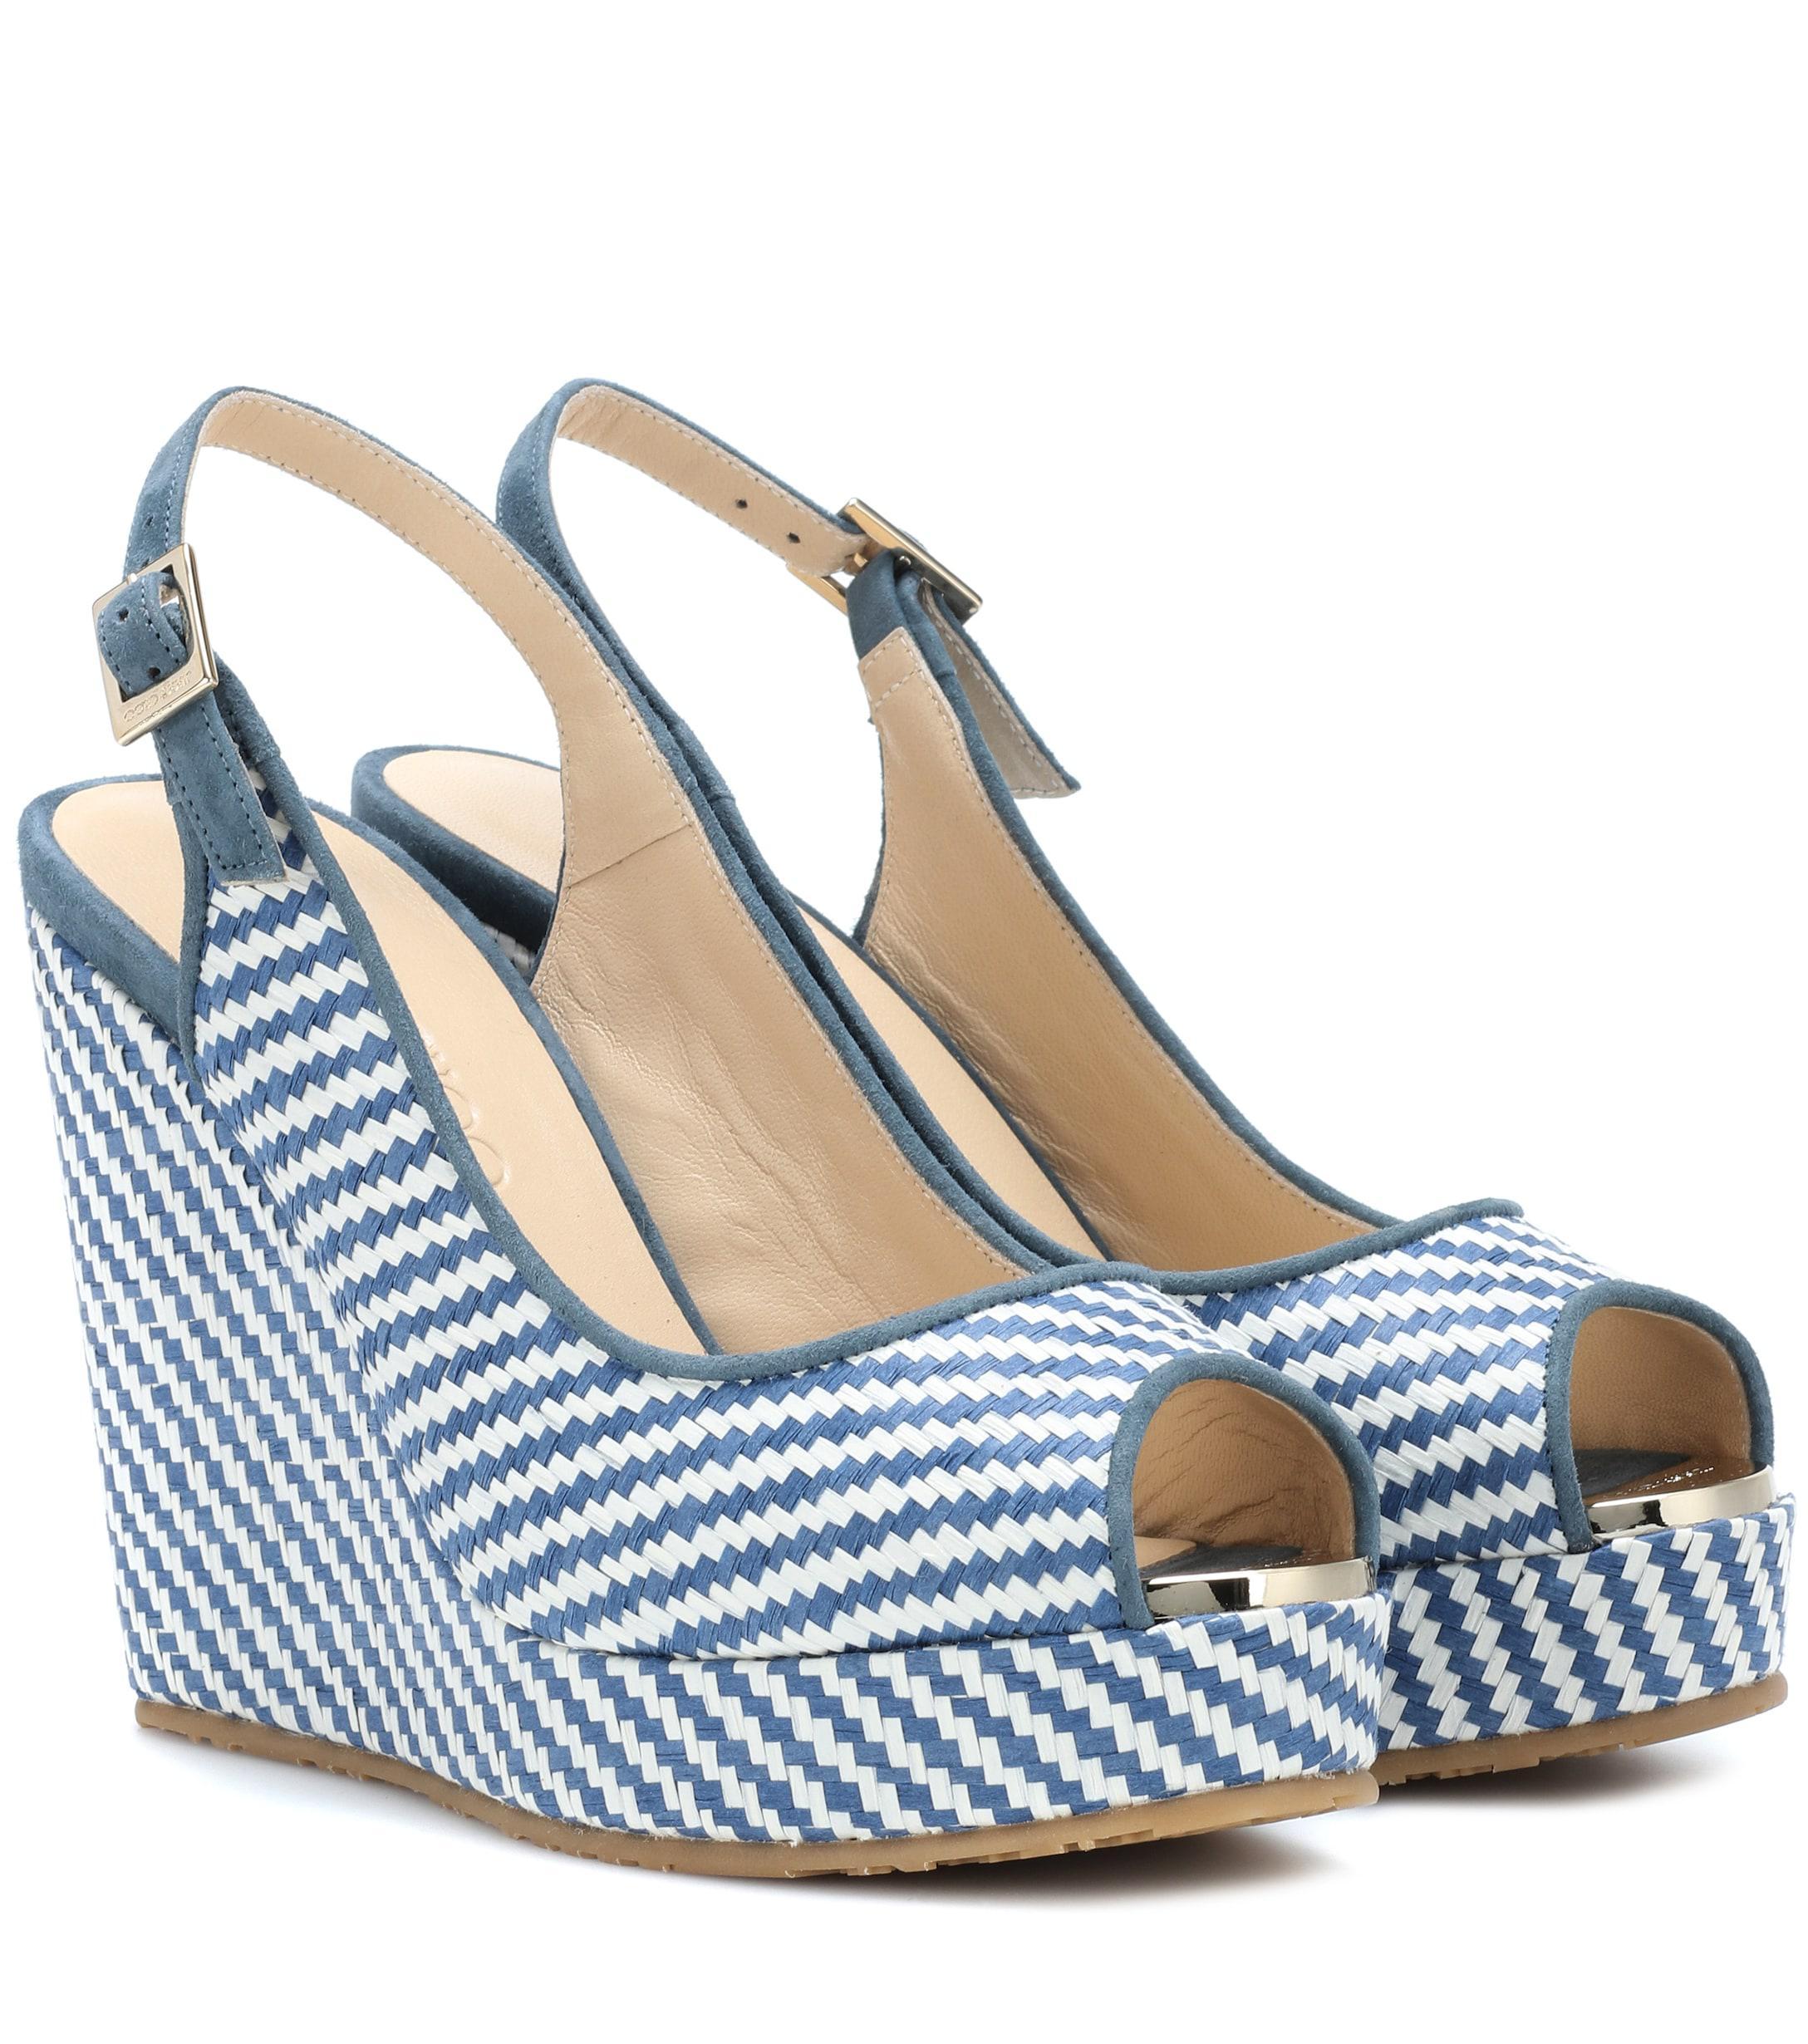 e2ffd05ce092 Lyst - Jimmy Choo Prova Wedge Sandals in Blue